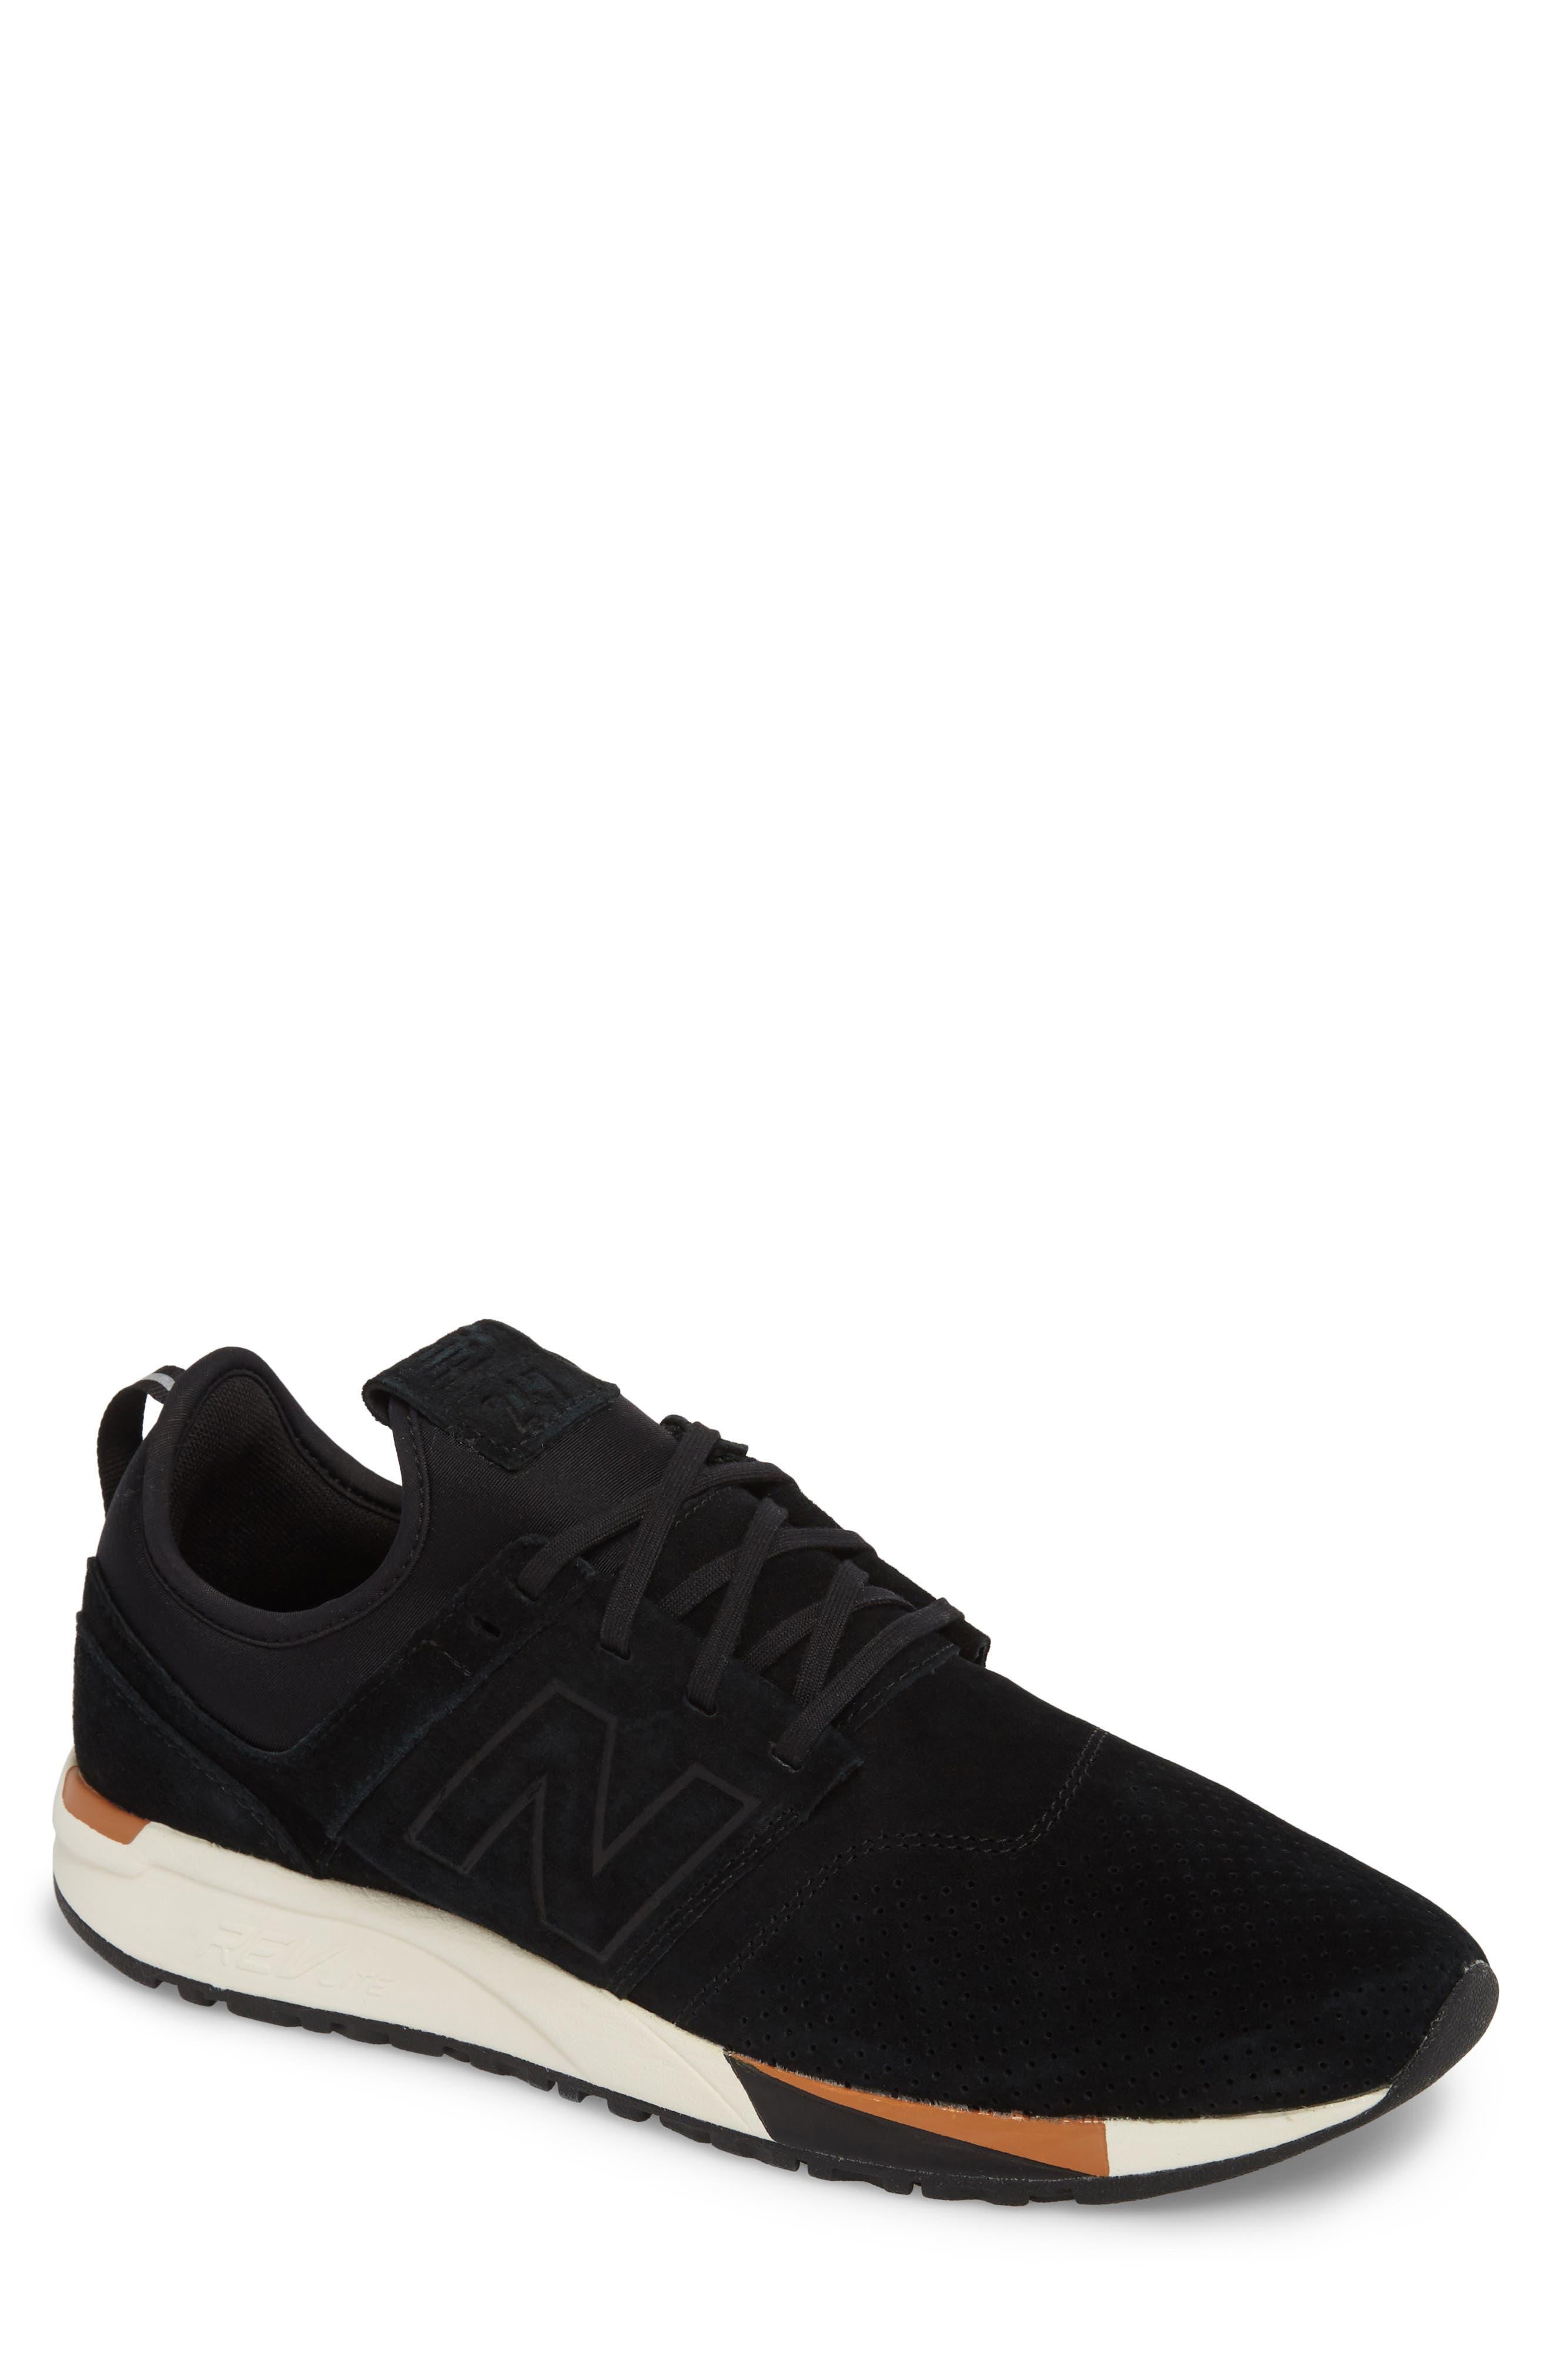 247 Luxe Sneaker,                             Main thumbnail 1, color,                             BLACK